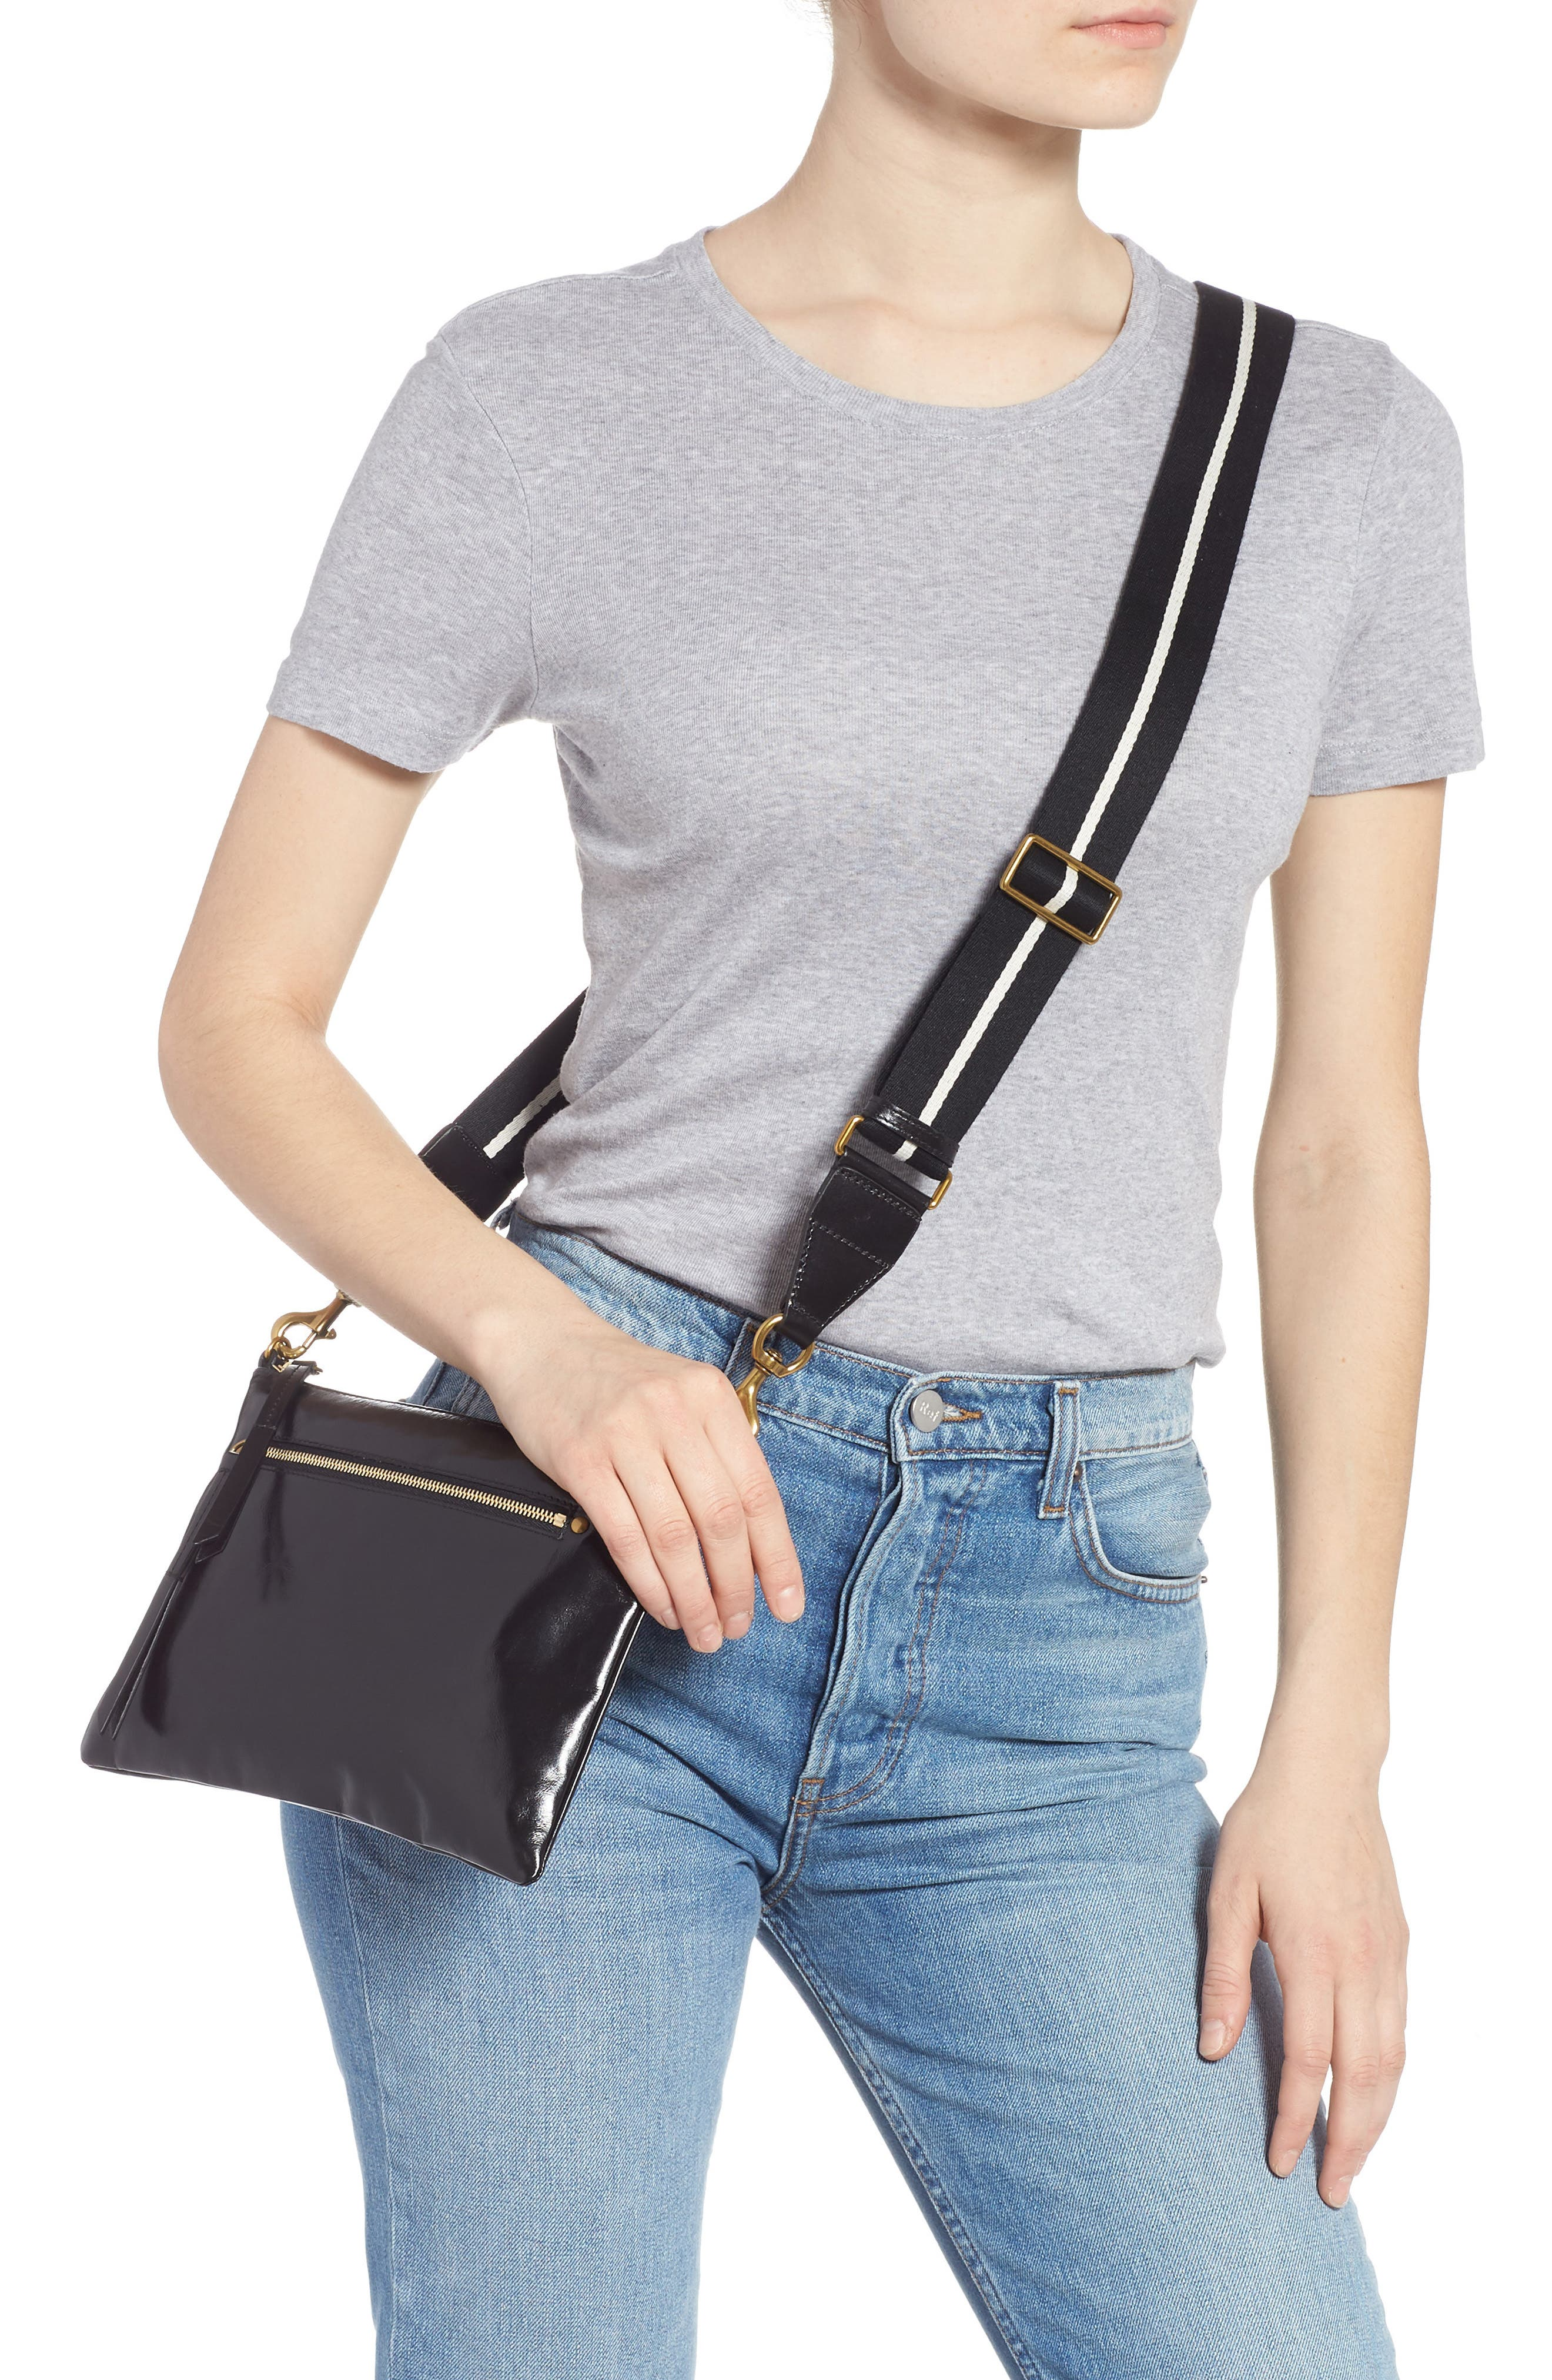 Nessah Leather Crossbody Bag,                             Alternate thumbnail 2, color,                             BLACK